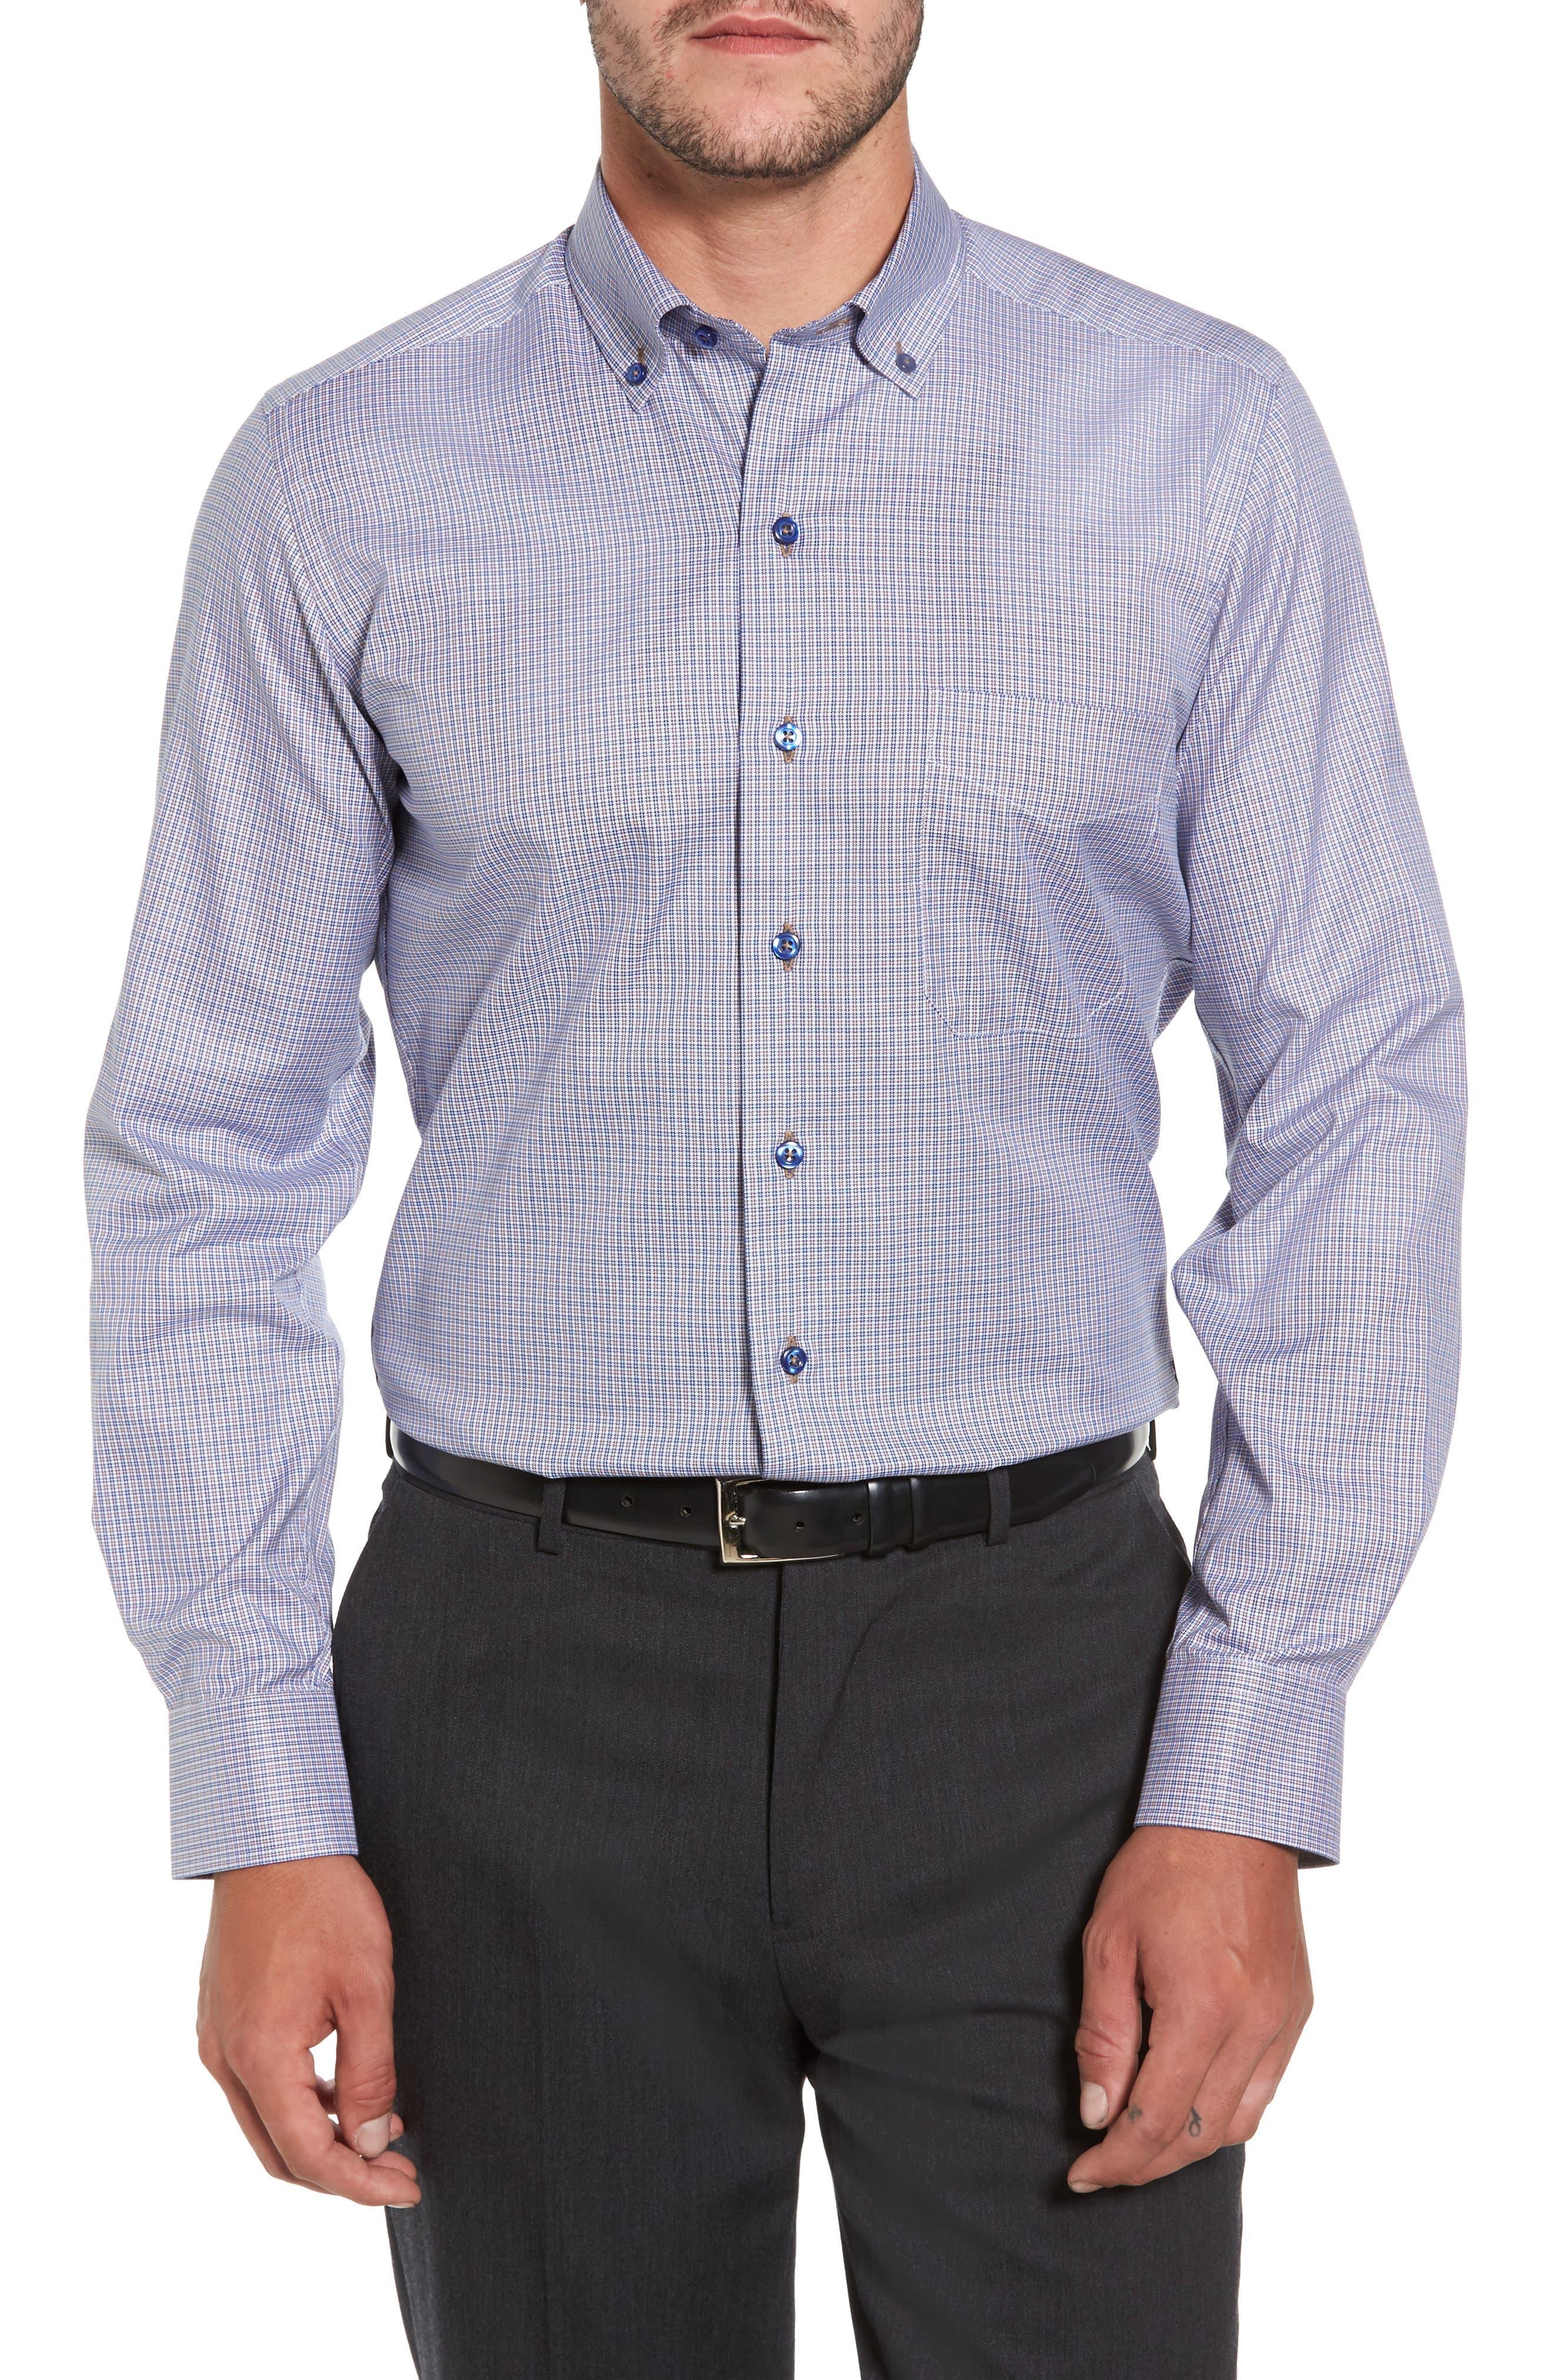 Microcheck Sport Shirt,                         Main,                         color, Navy/ Chocolate